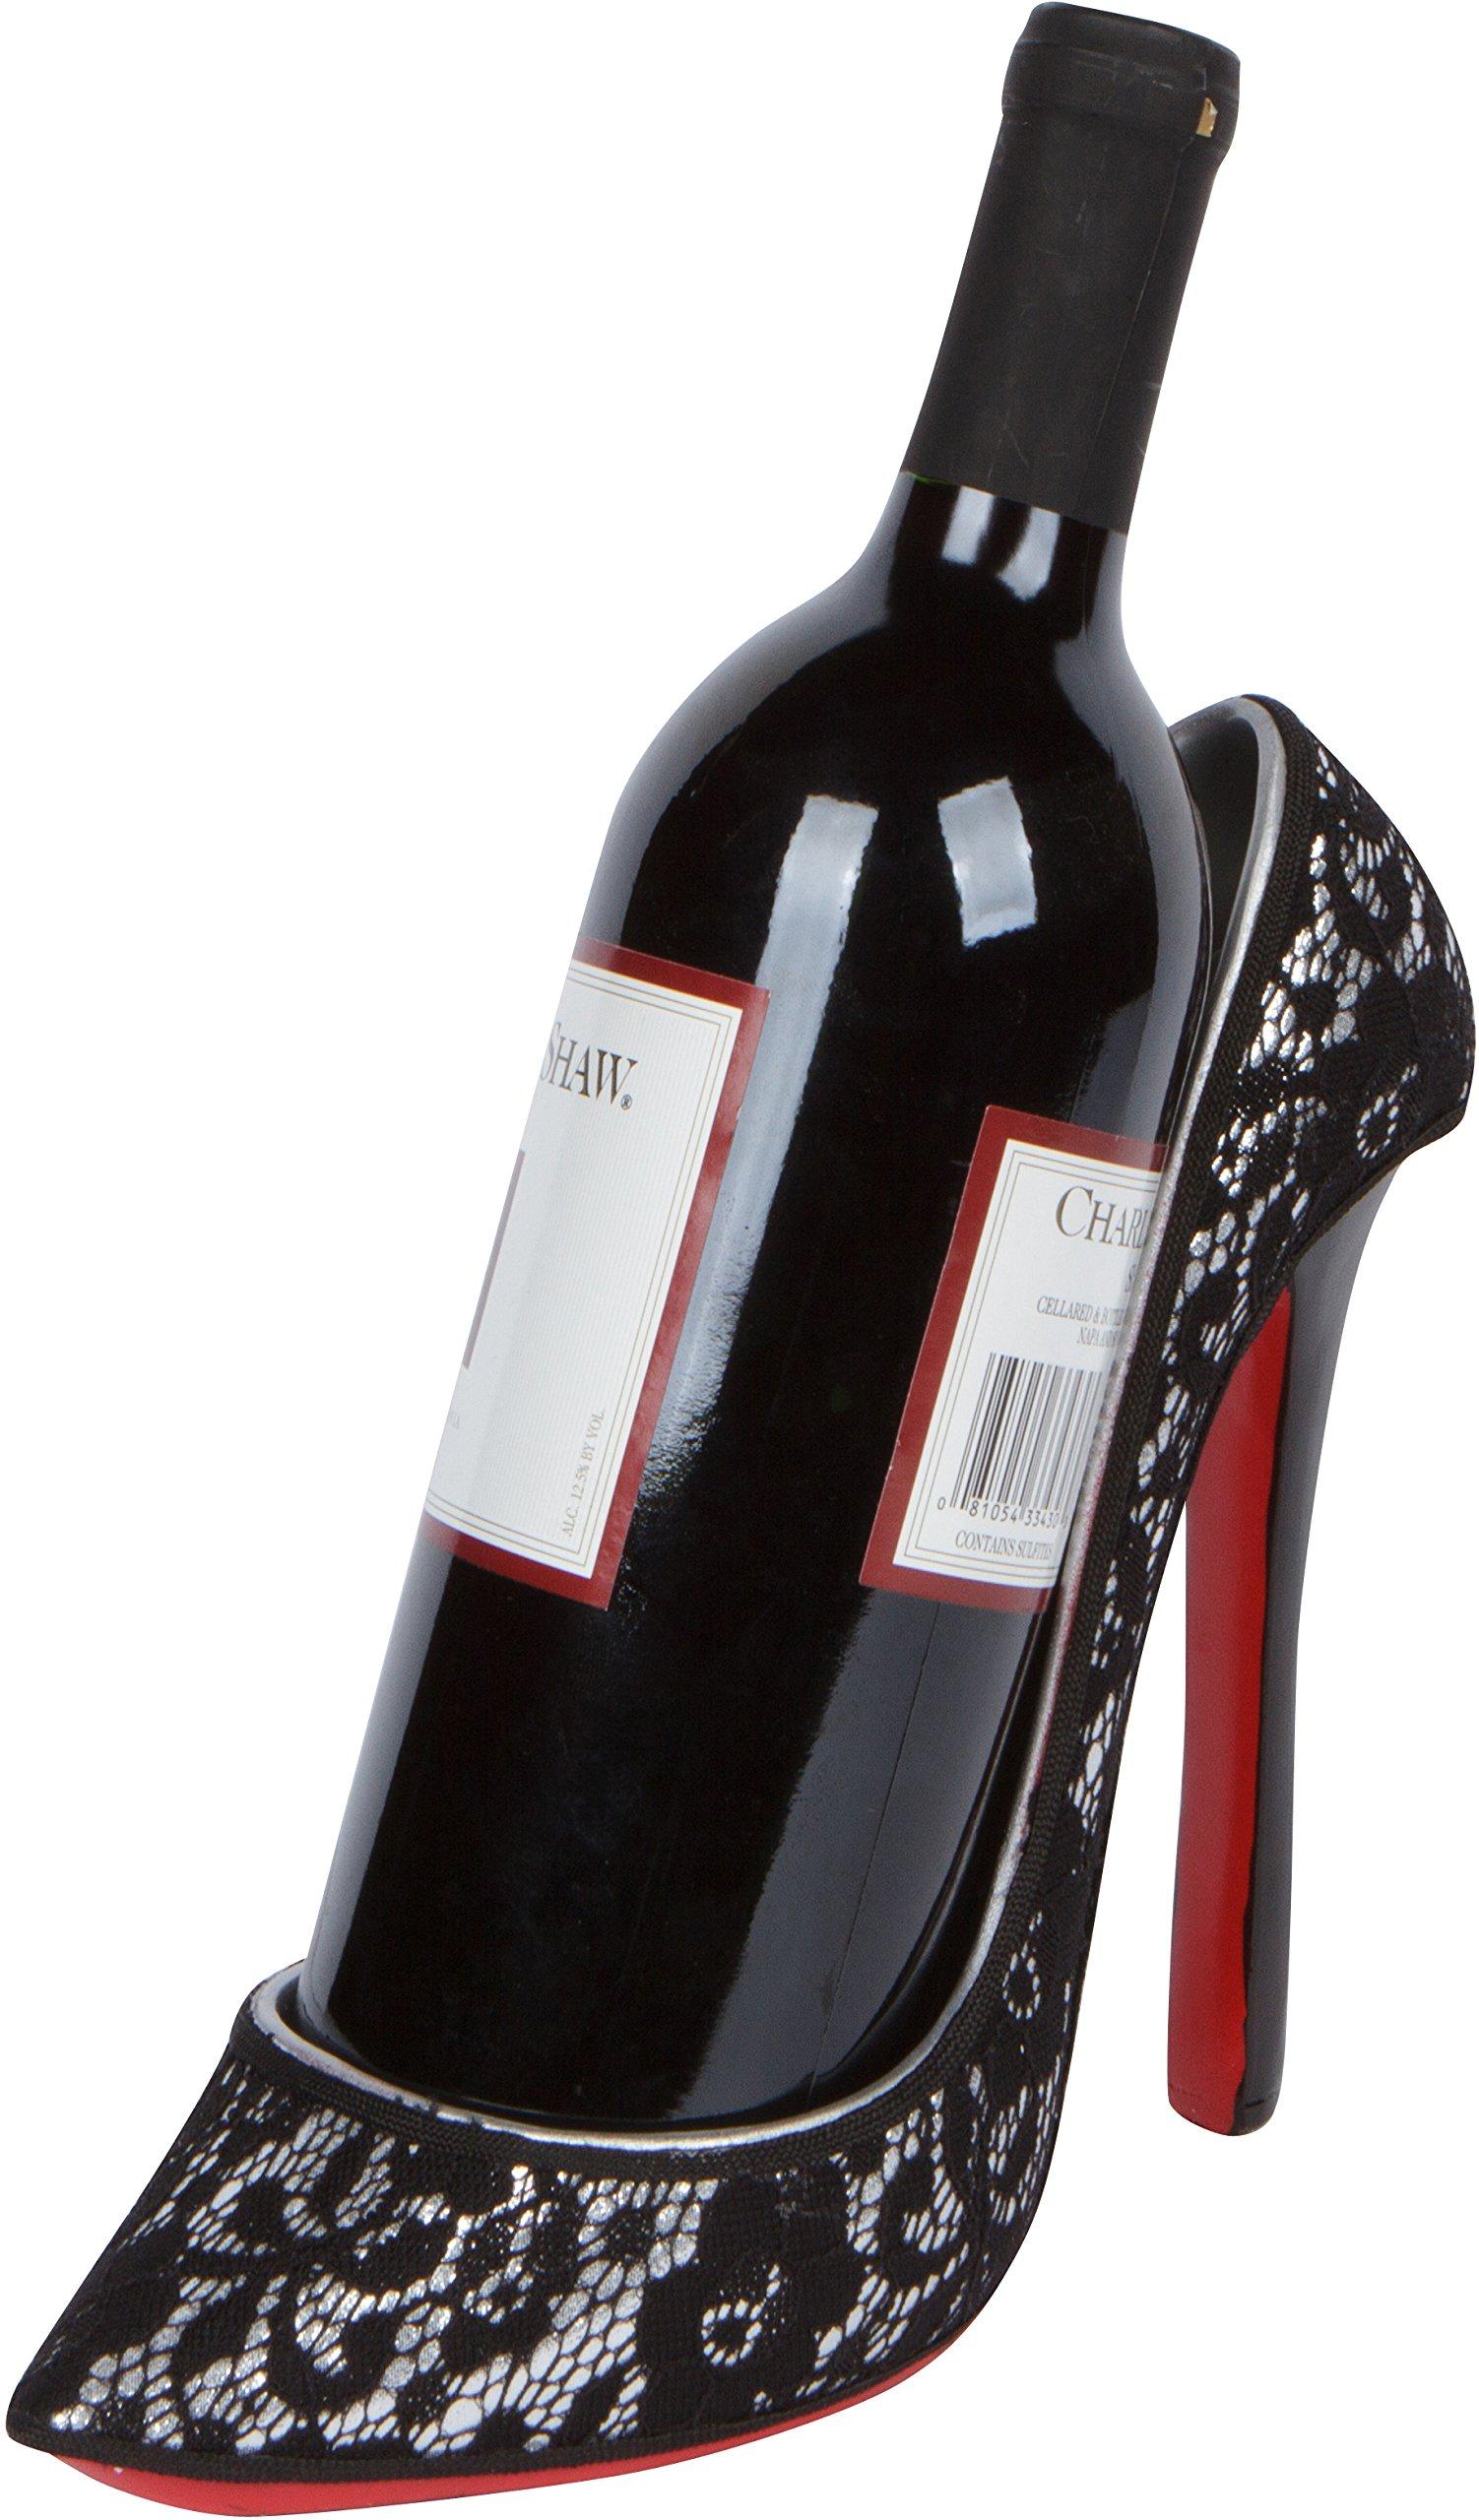 8.5'' x 7''H High Heel Wine Bottle Holder - Stylish Conversation Starter Wine Rack By Hilarious Home (Black/Silver Lace)